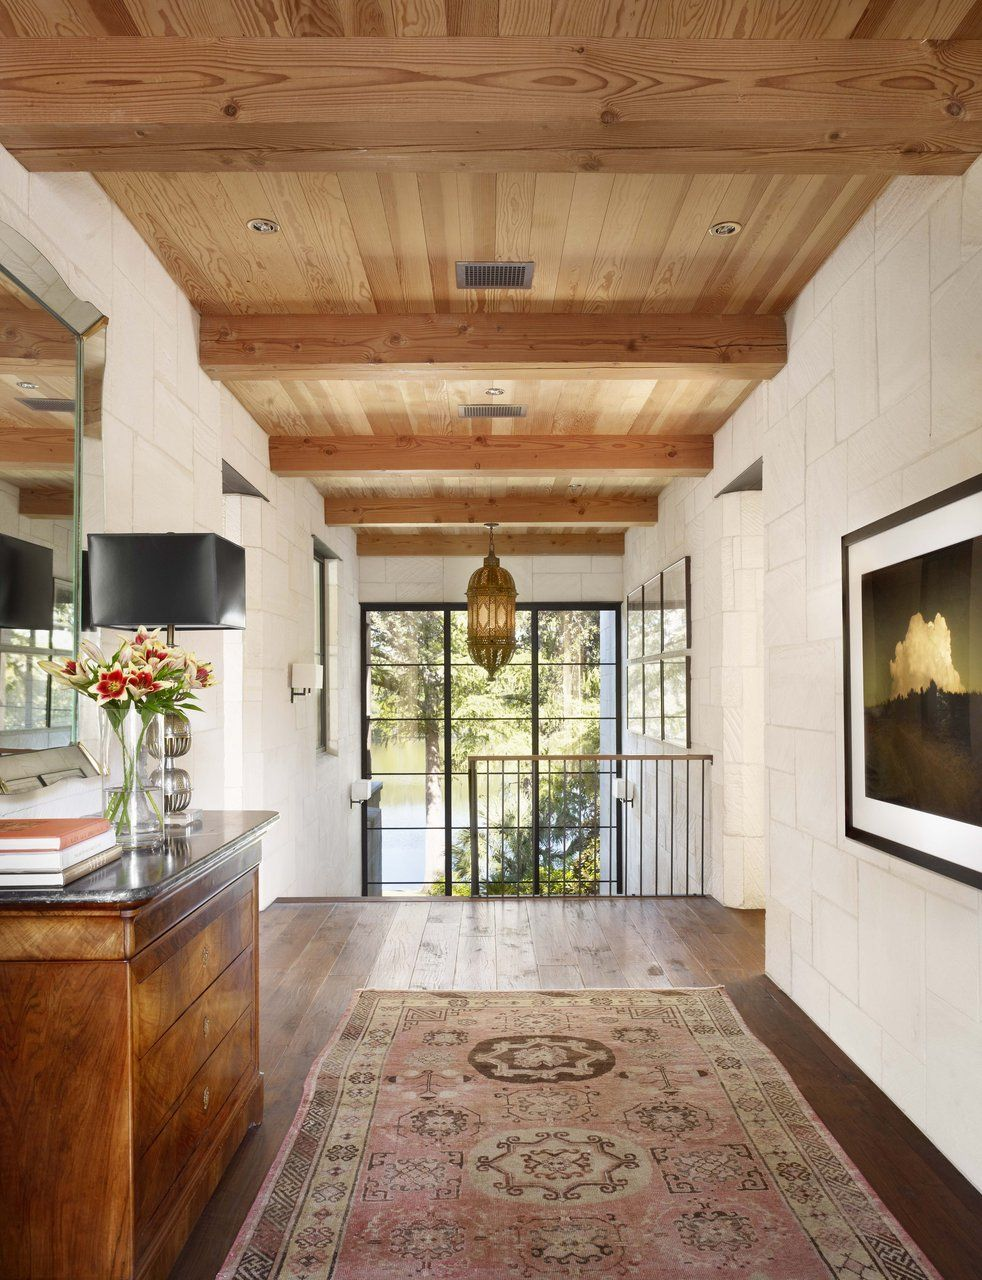 Joanna gaines hallway decor  Hallway  Interior Design Ideas  Pinterest  Street Ceiling and